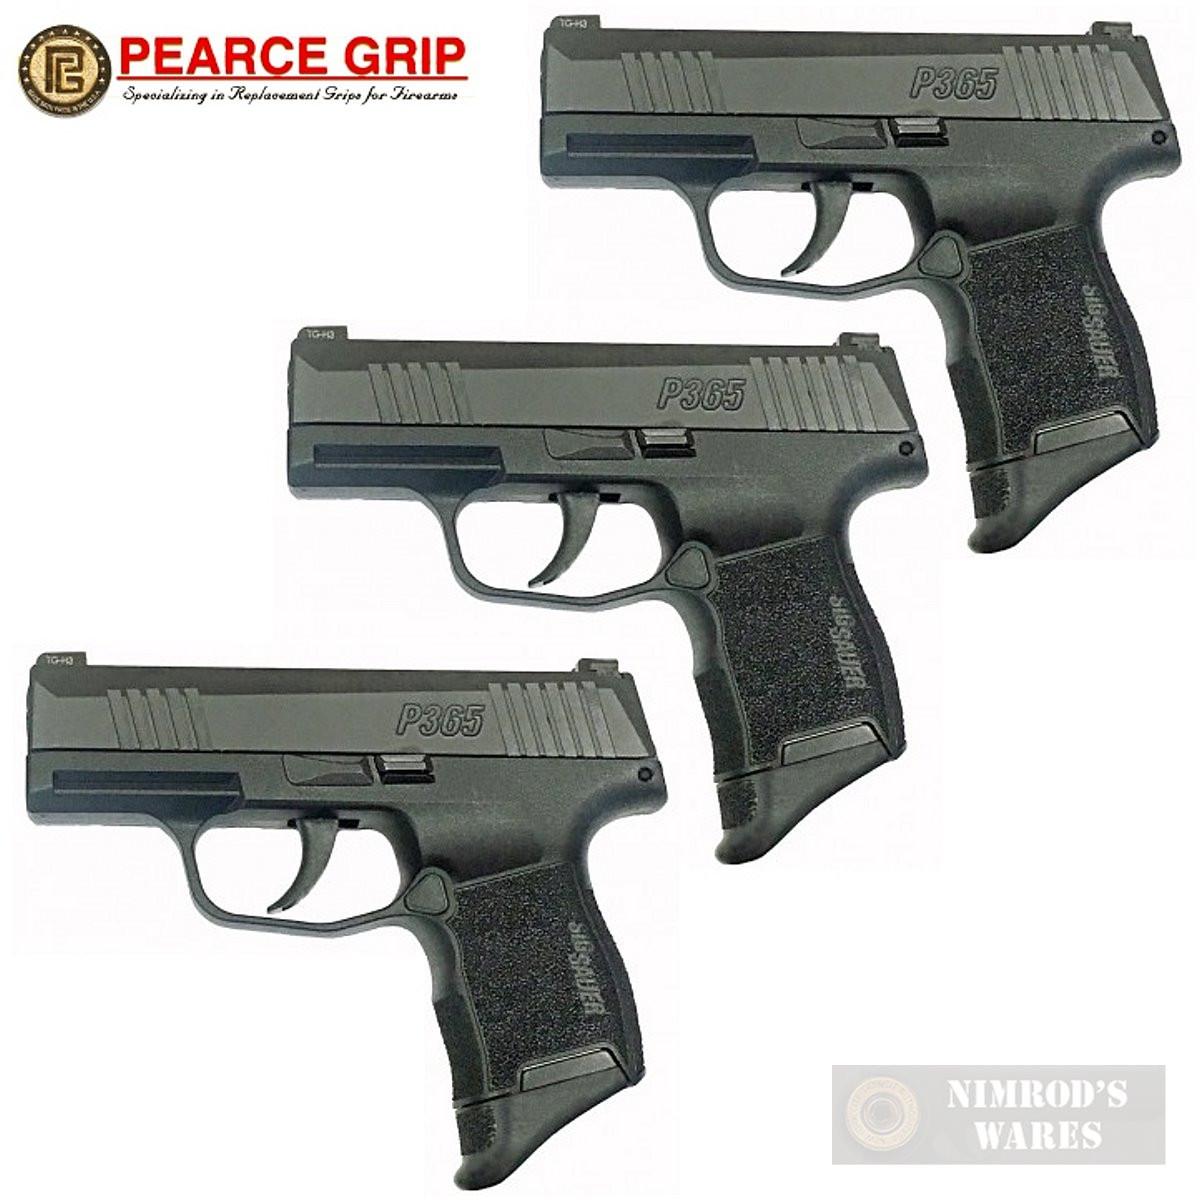 Pearce Grip SIG SAUER P365 GRIP EXTENSION 3-PACK 5/8